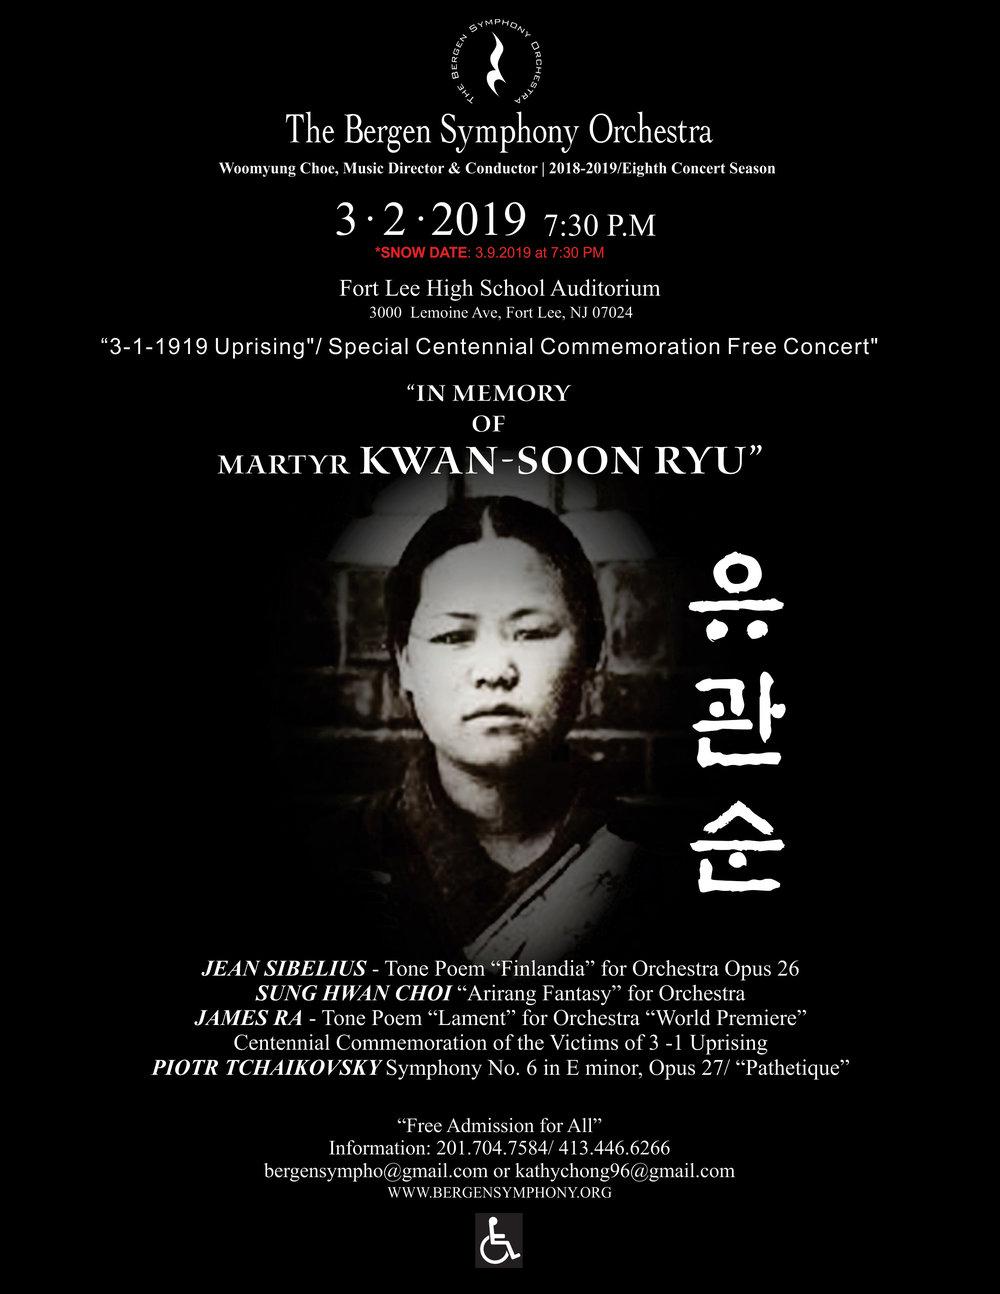 Finalnew ryu kwan soon poster.jpg